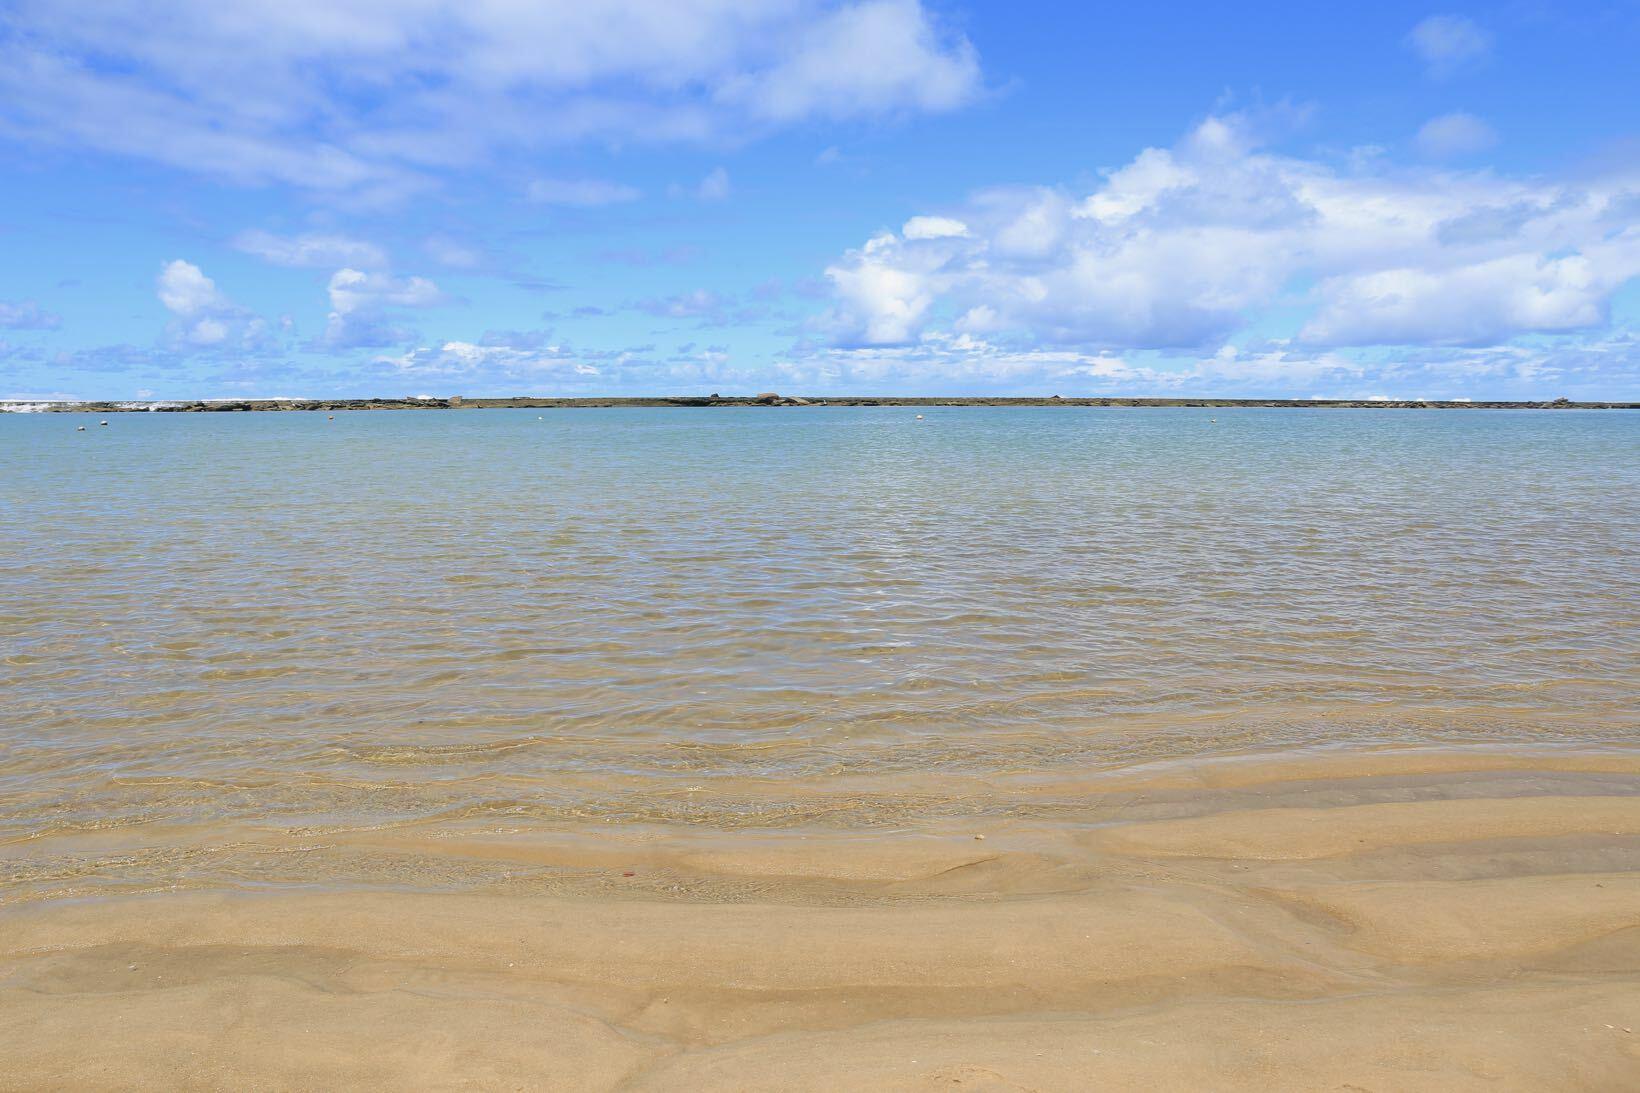 tabua de marés praias